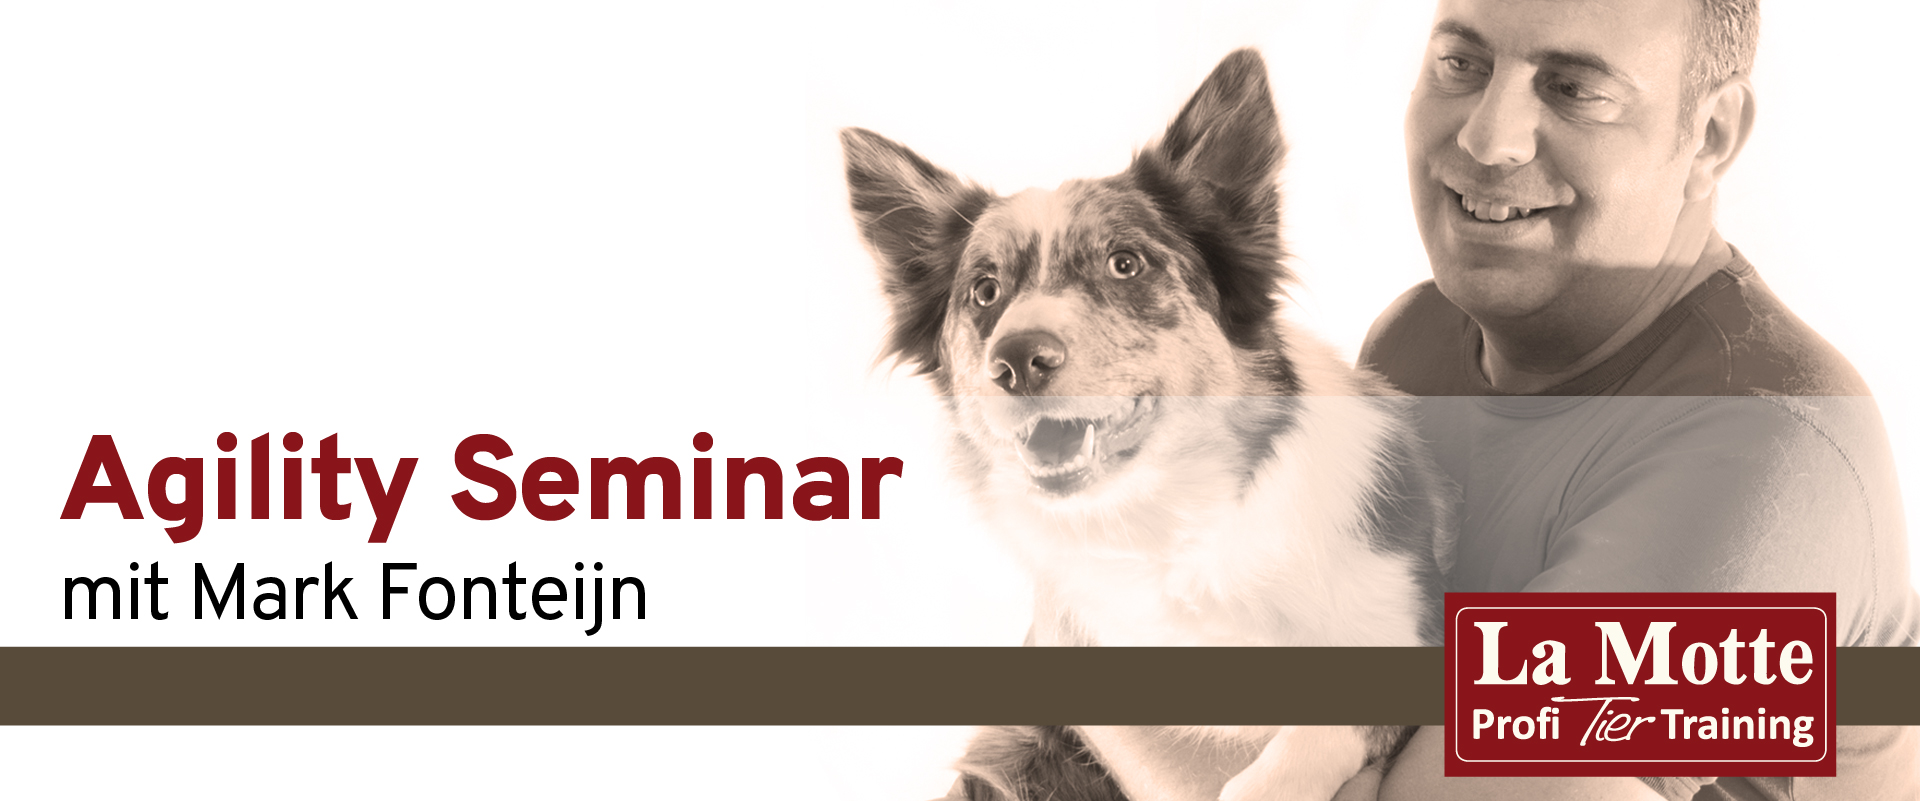 Agility Seminar mit Mark Fonteijn